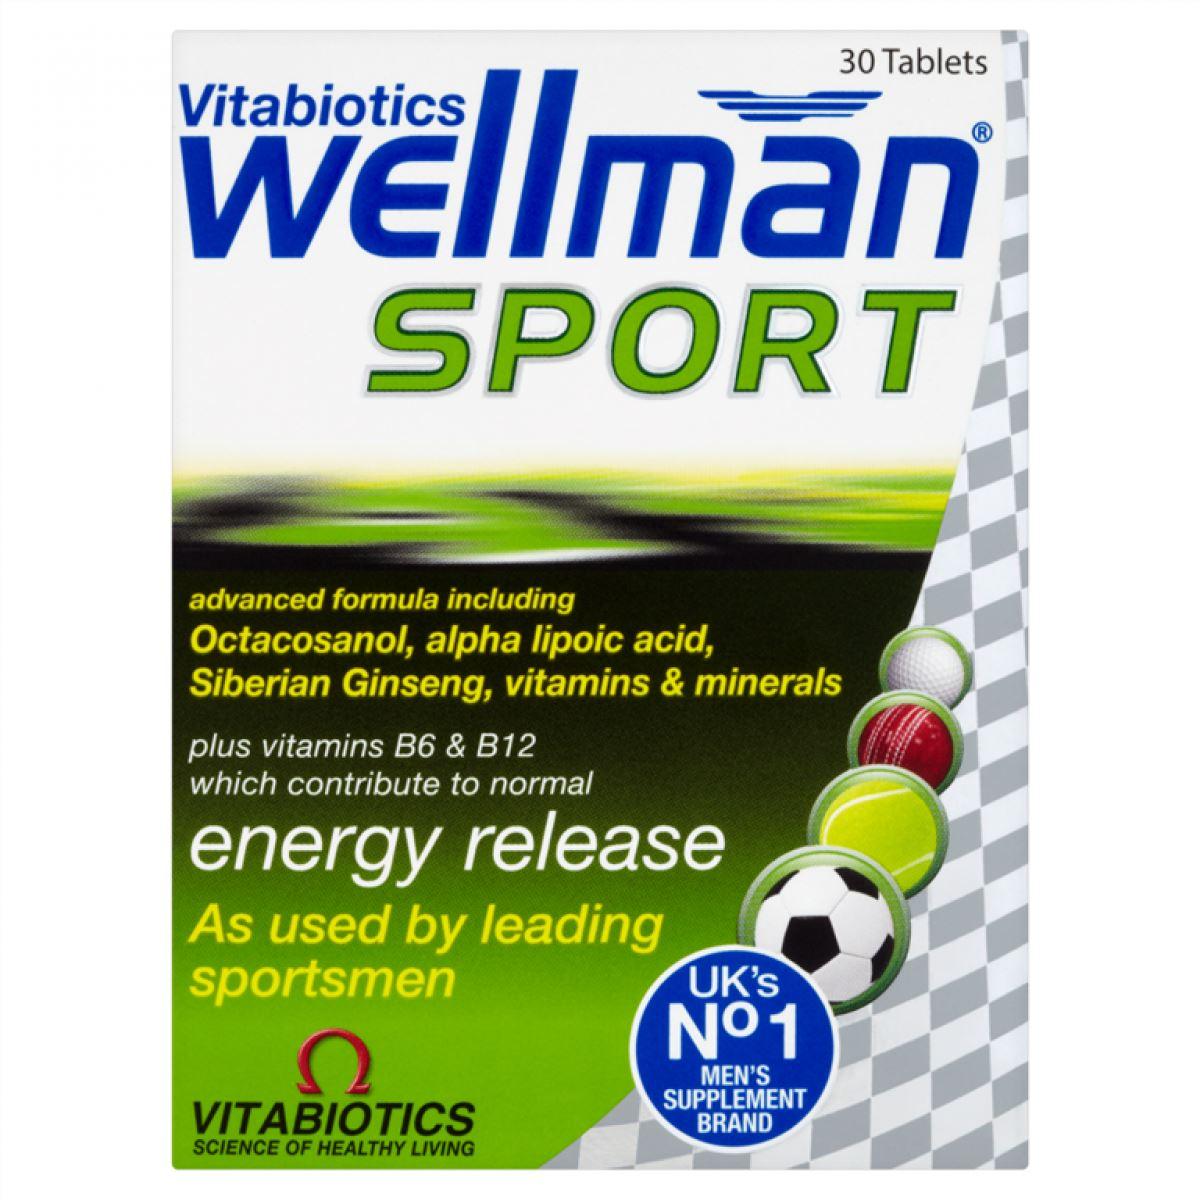 Vitabiotics Wellman Sport 30 Tablets - 3 Pack